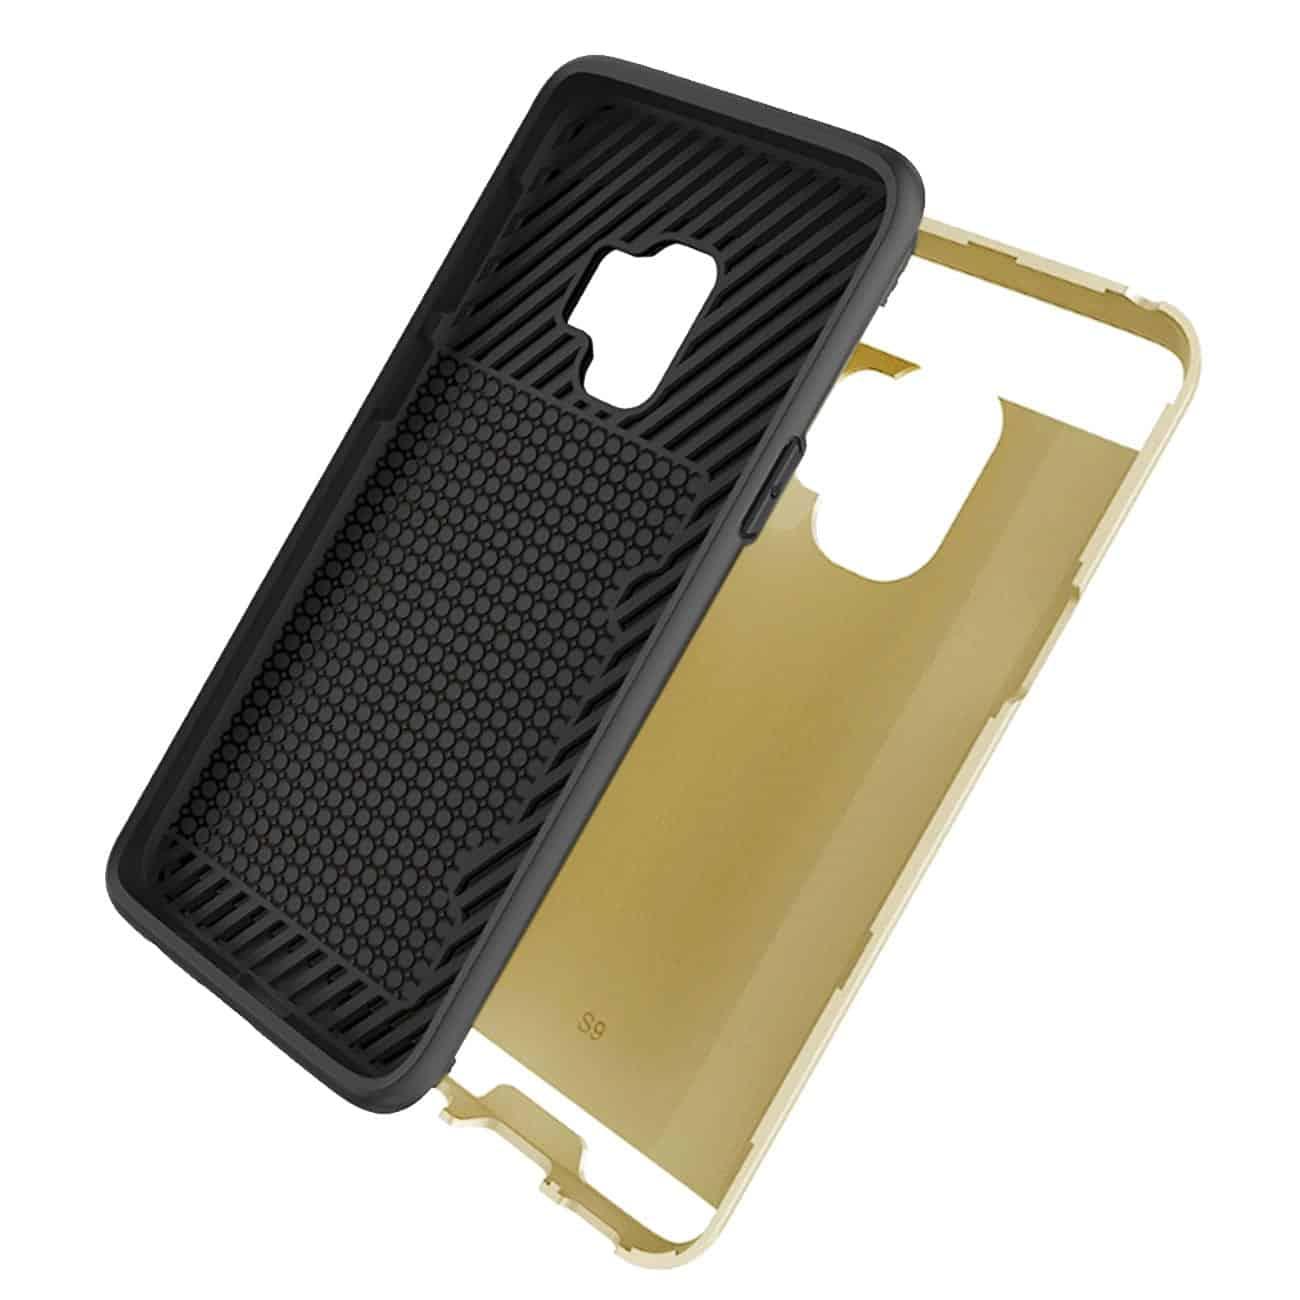 Samsung Galaxy S9 Slim Armor Hybrid Case With Card Holder In Gold